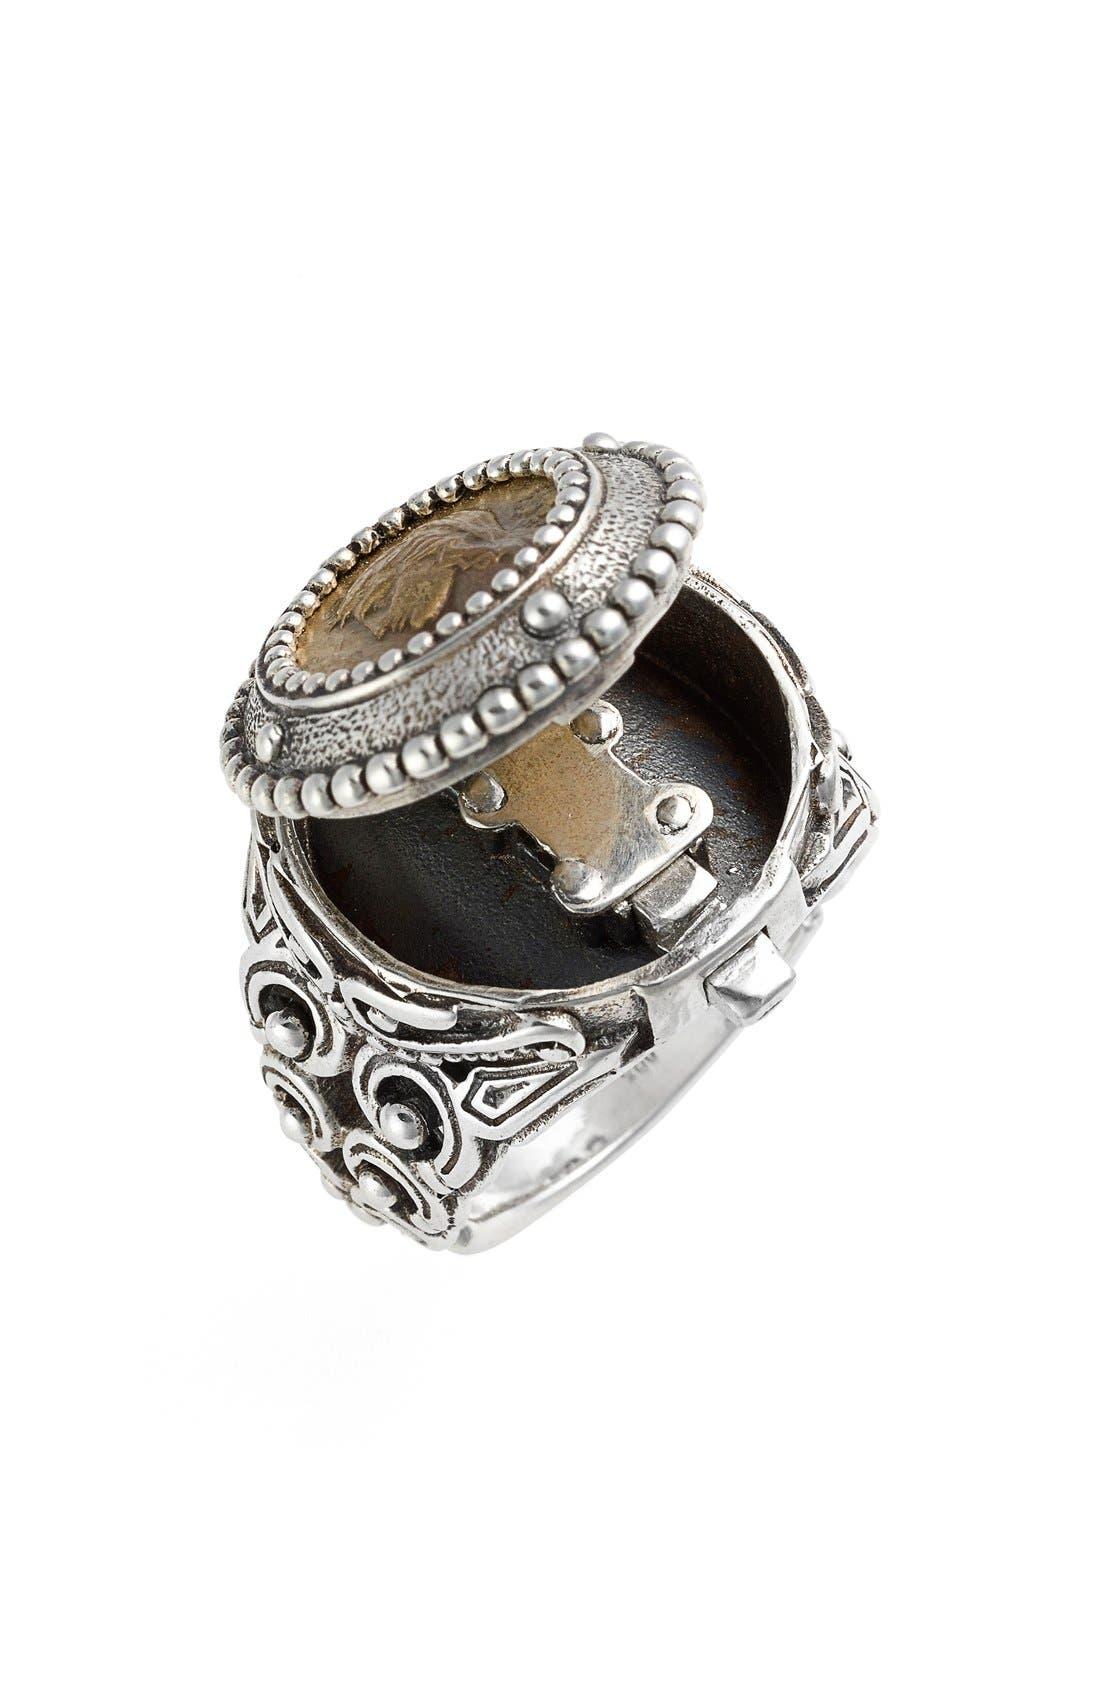 'Arethusa' Hinged Coin Ring,                             Alternate thumbnail 2, color,                             040